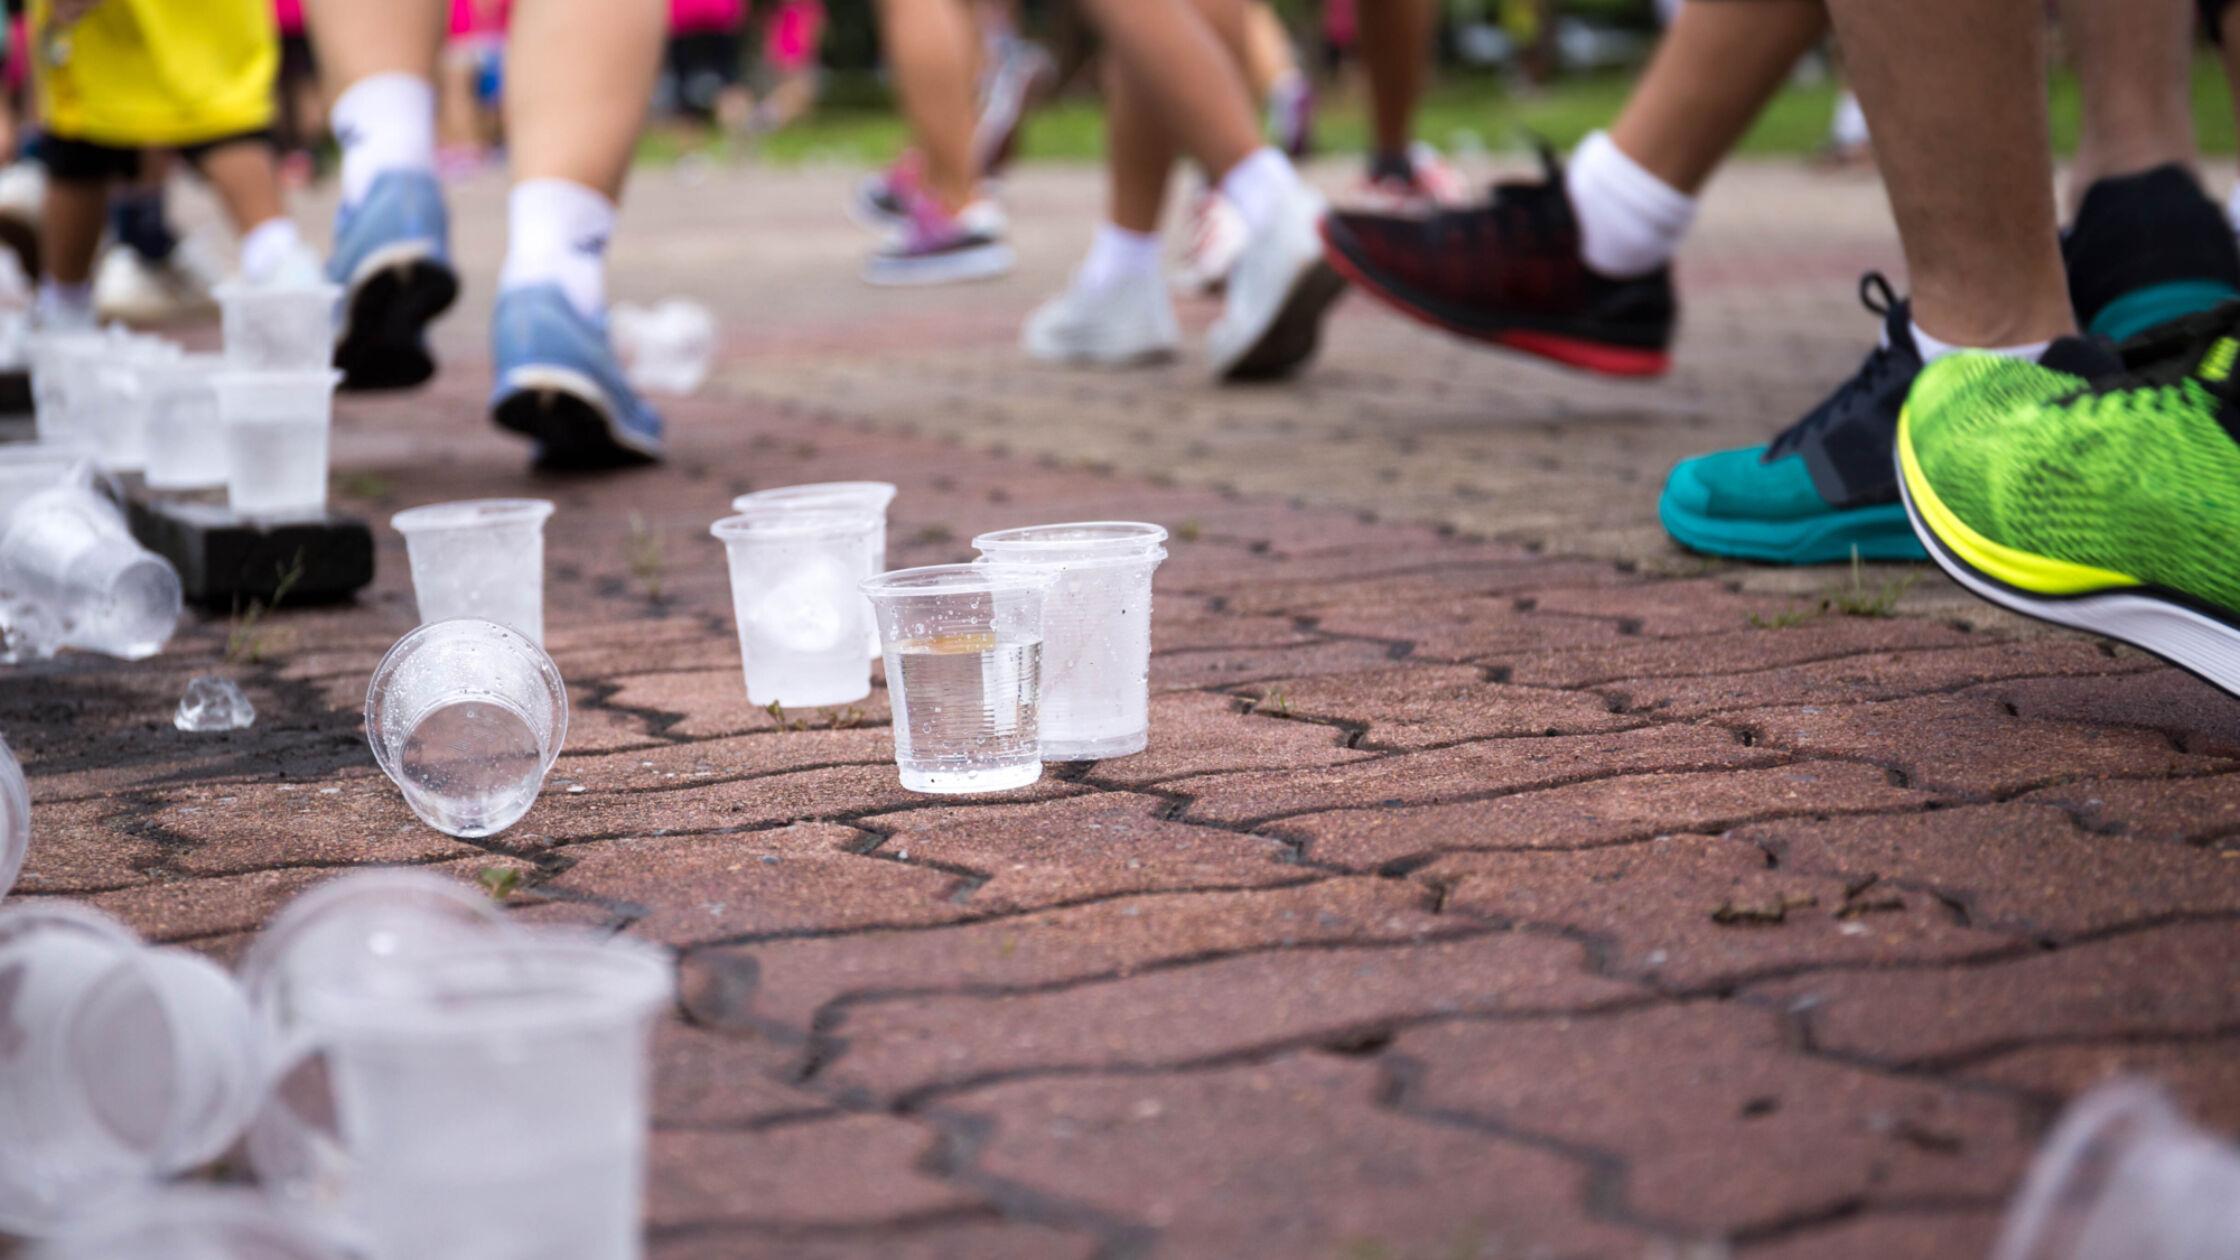 Troeptrimmen: hardlopen en afval opruimen